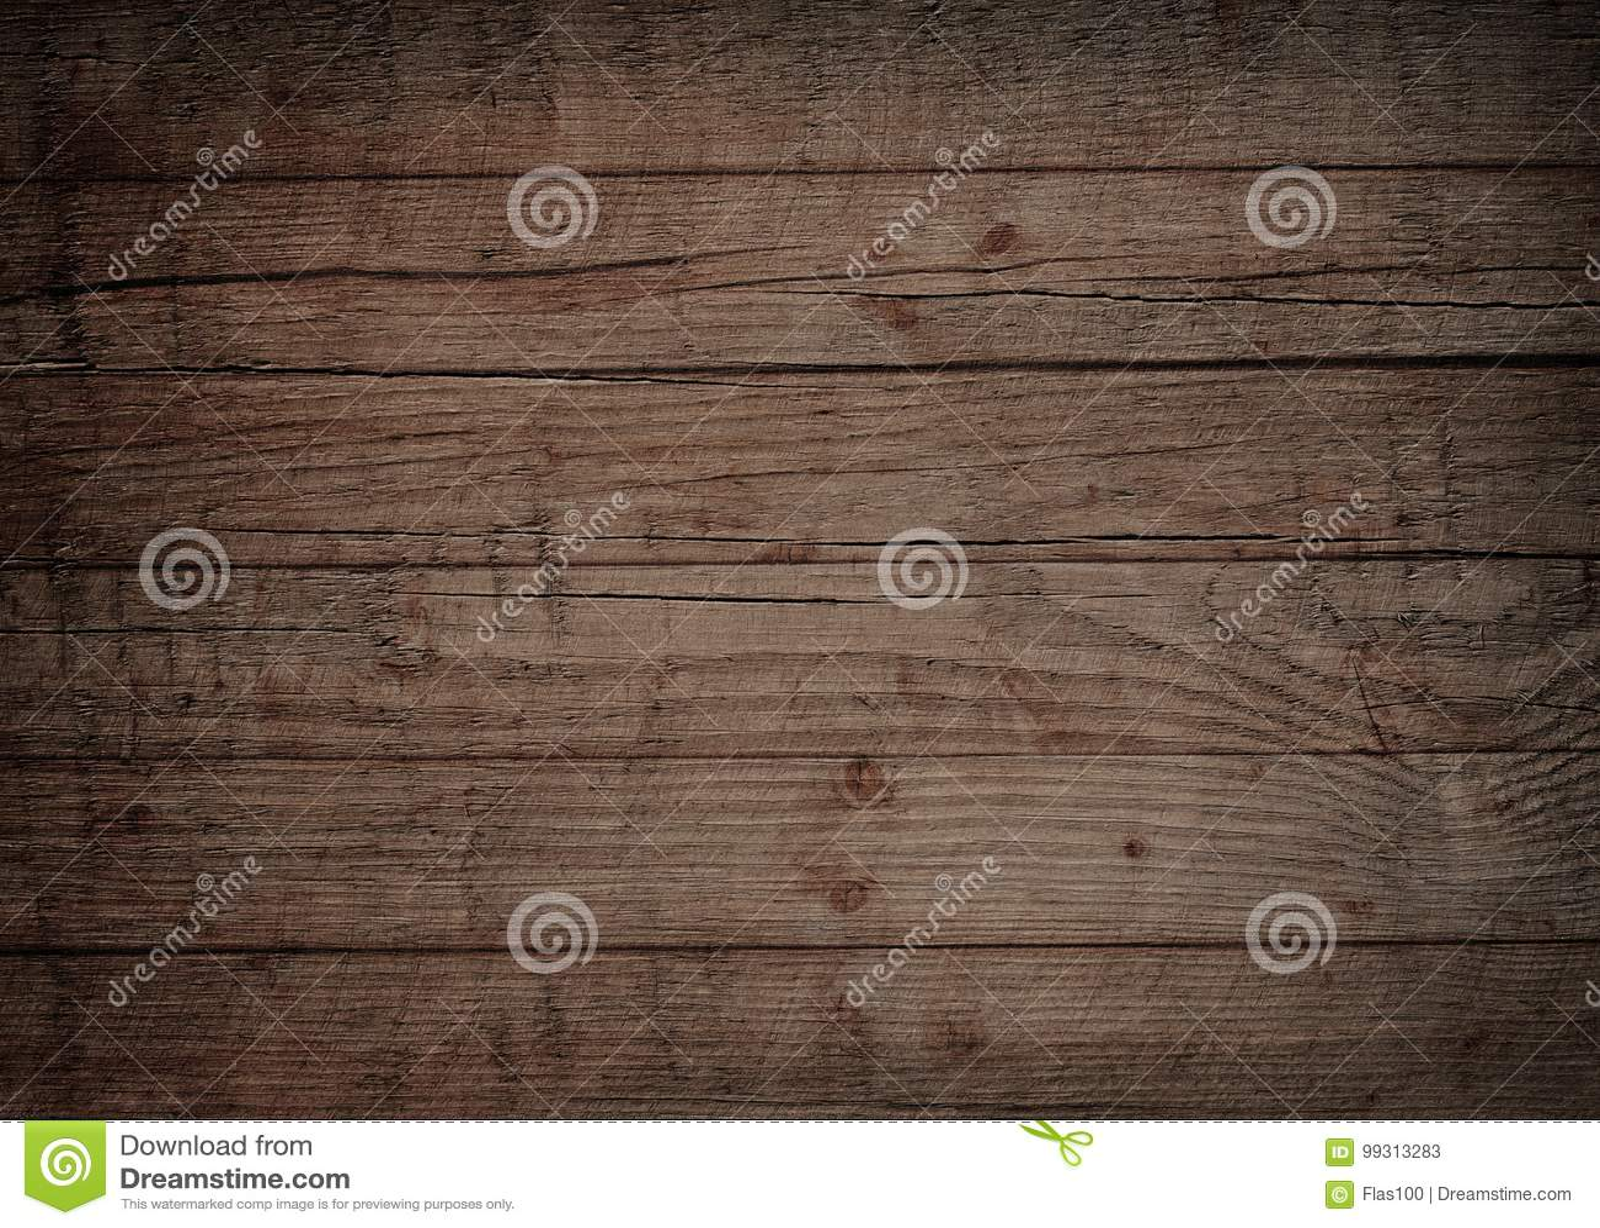 Beste Bruine Houten Muur, Planken, Lijst, Vloeroppervlakte Donkere RK-22